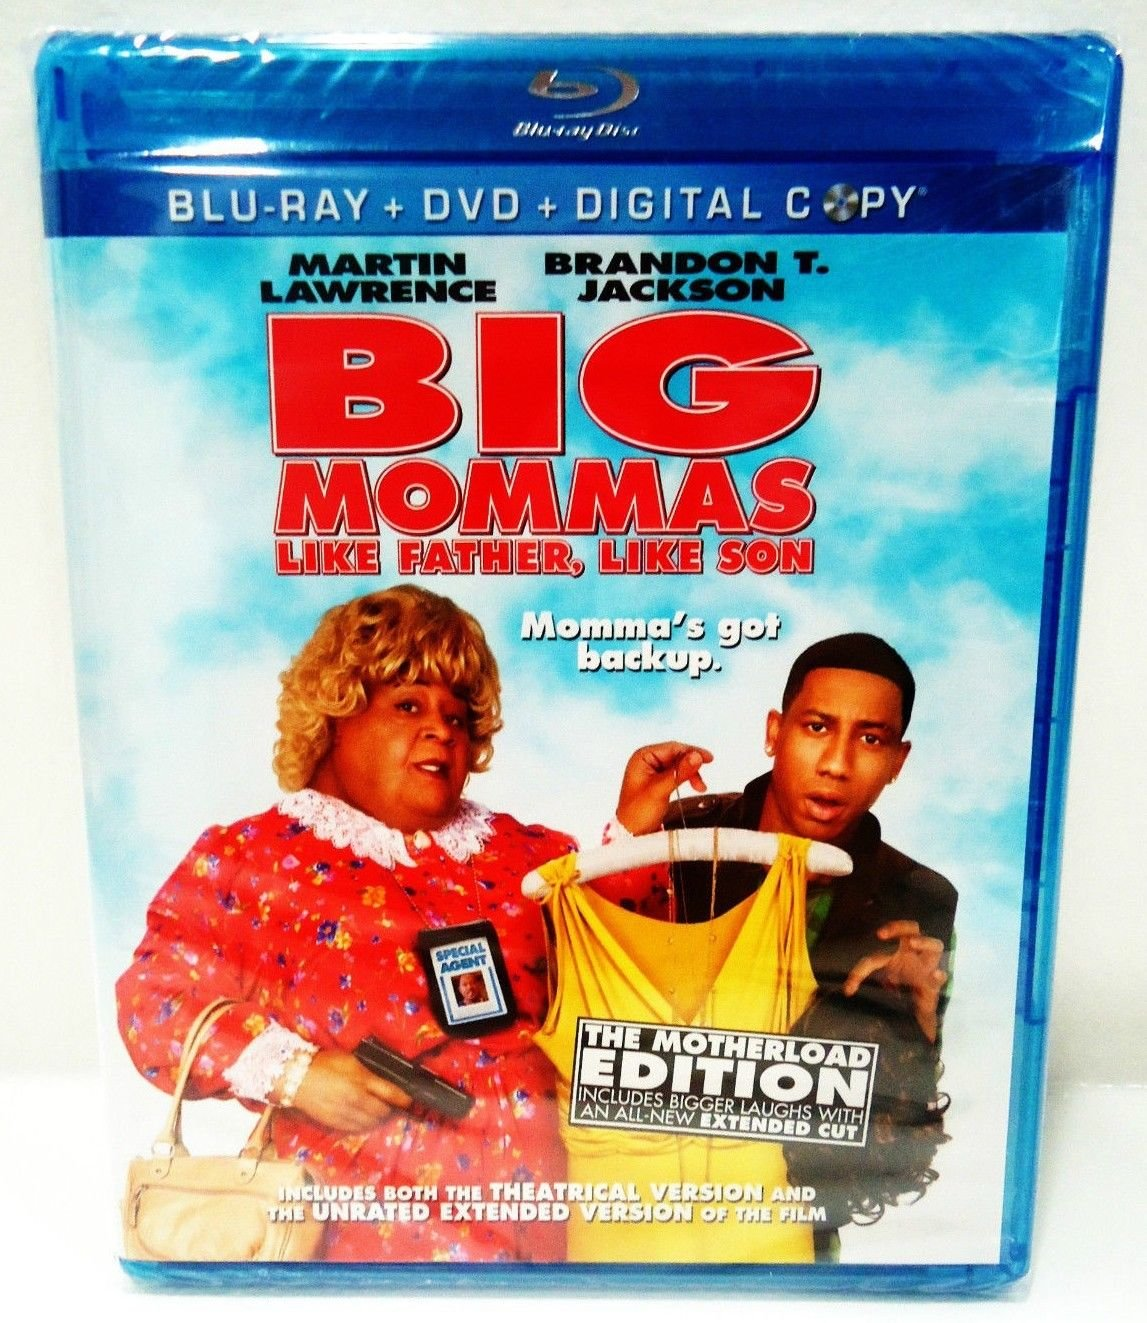 BIG MOMMAS - DVD - BLU-RAY - MARTIN LAWRENCE - NEW - 3 DISC SET - COMEDY - MOVIE